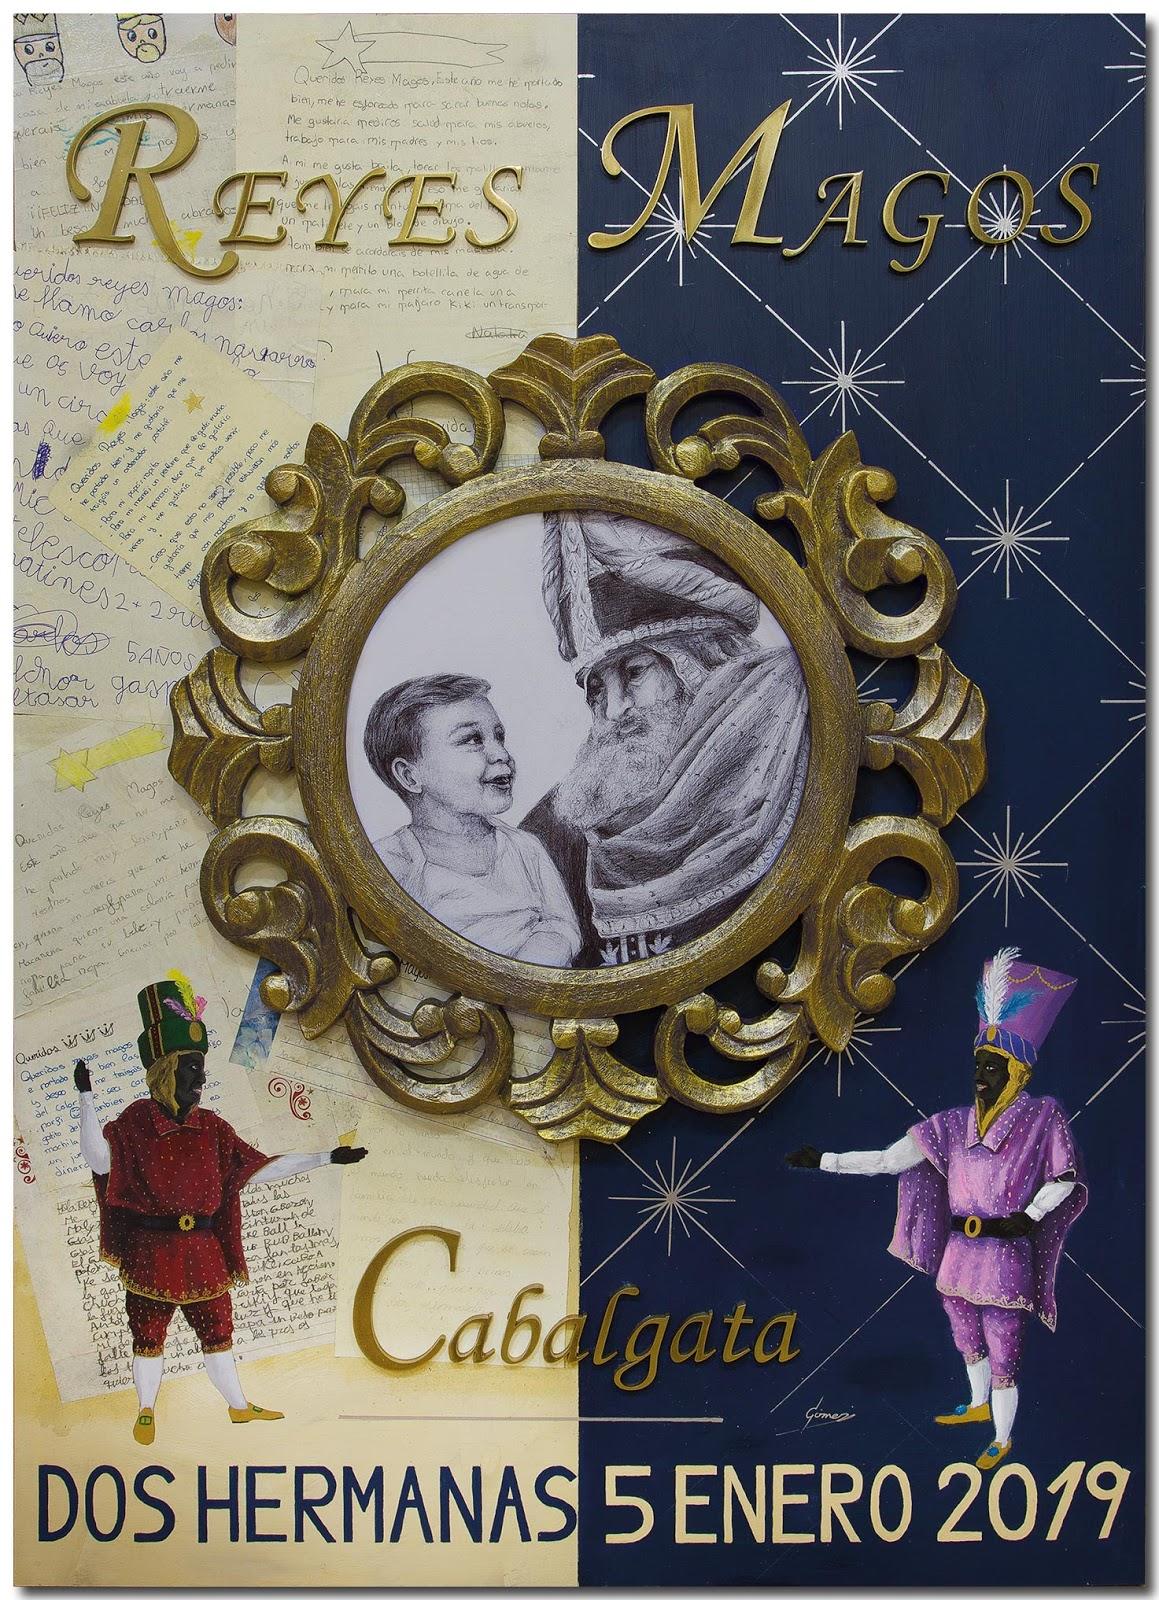 Cartel Cabalgata 2019, autor: Diego Gómez Sánchez